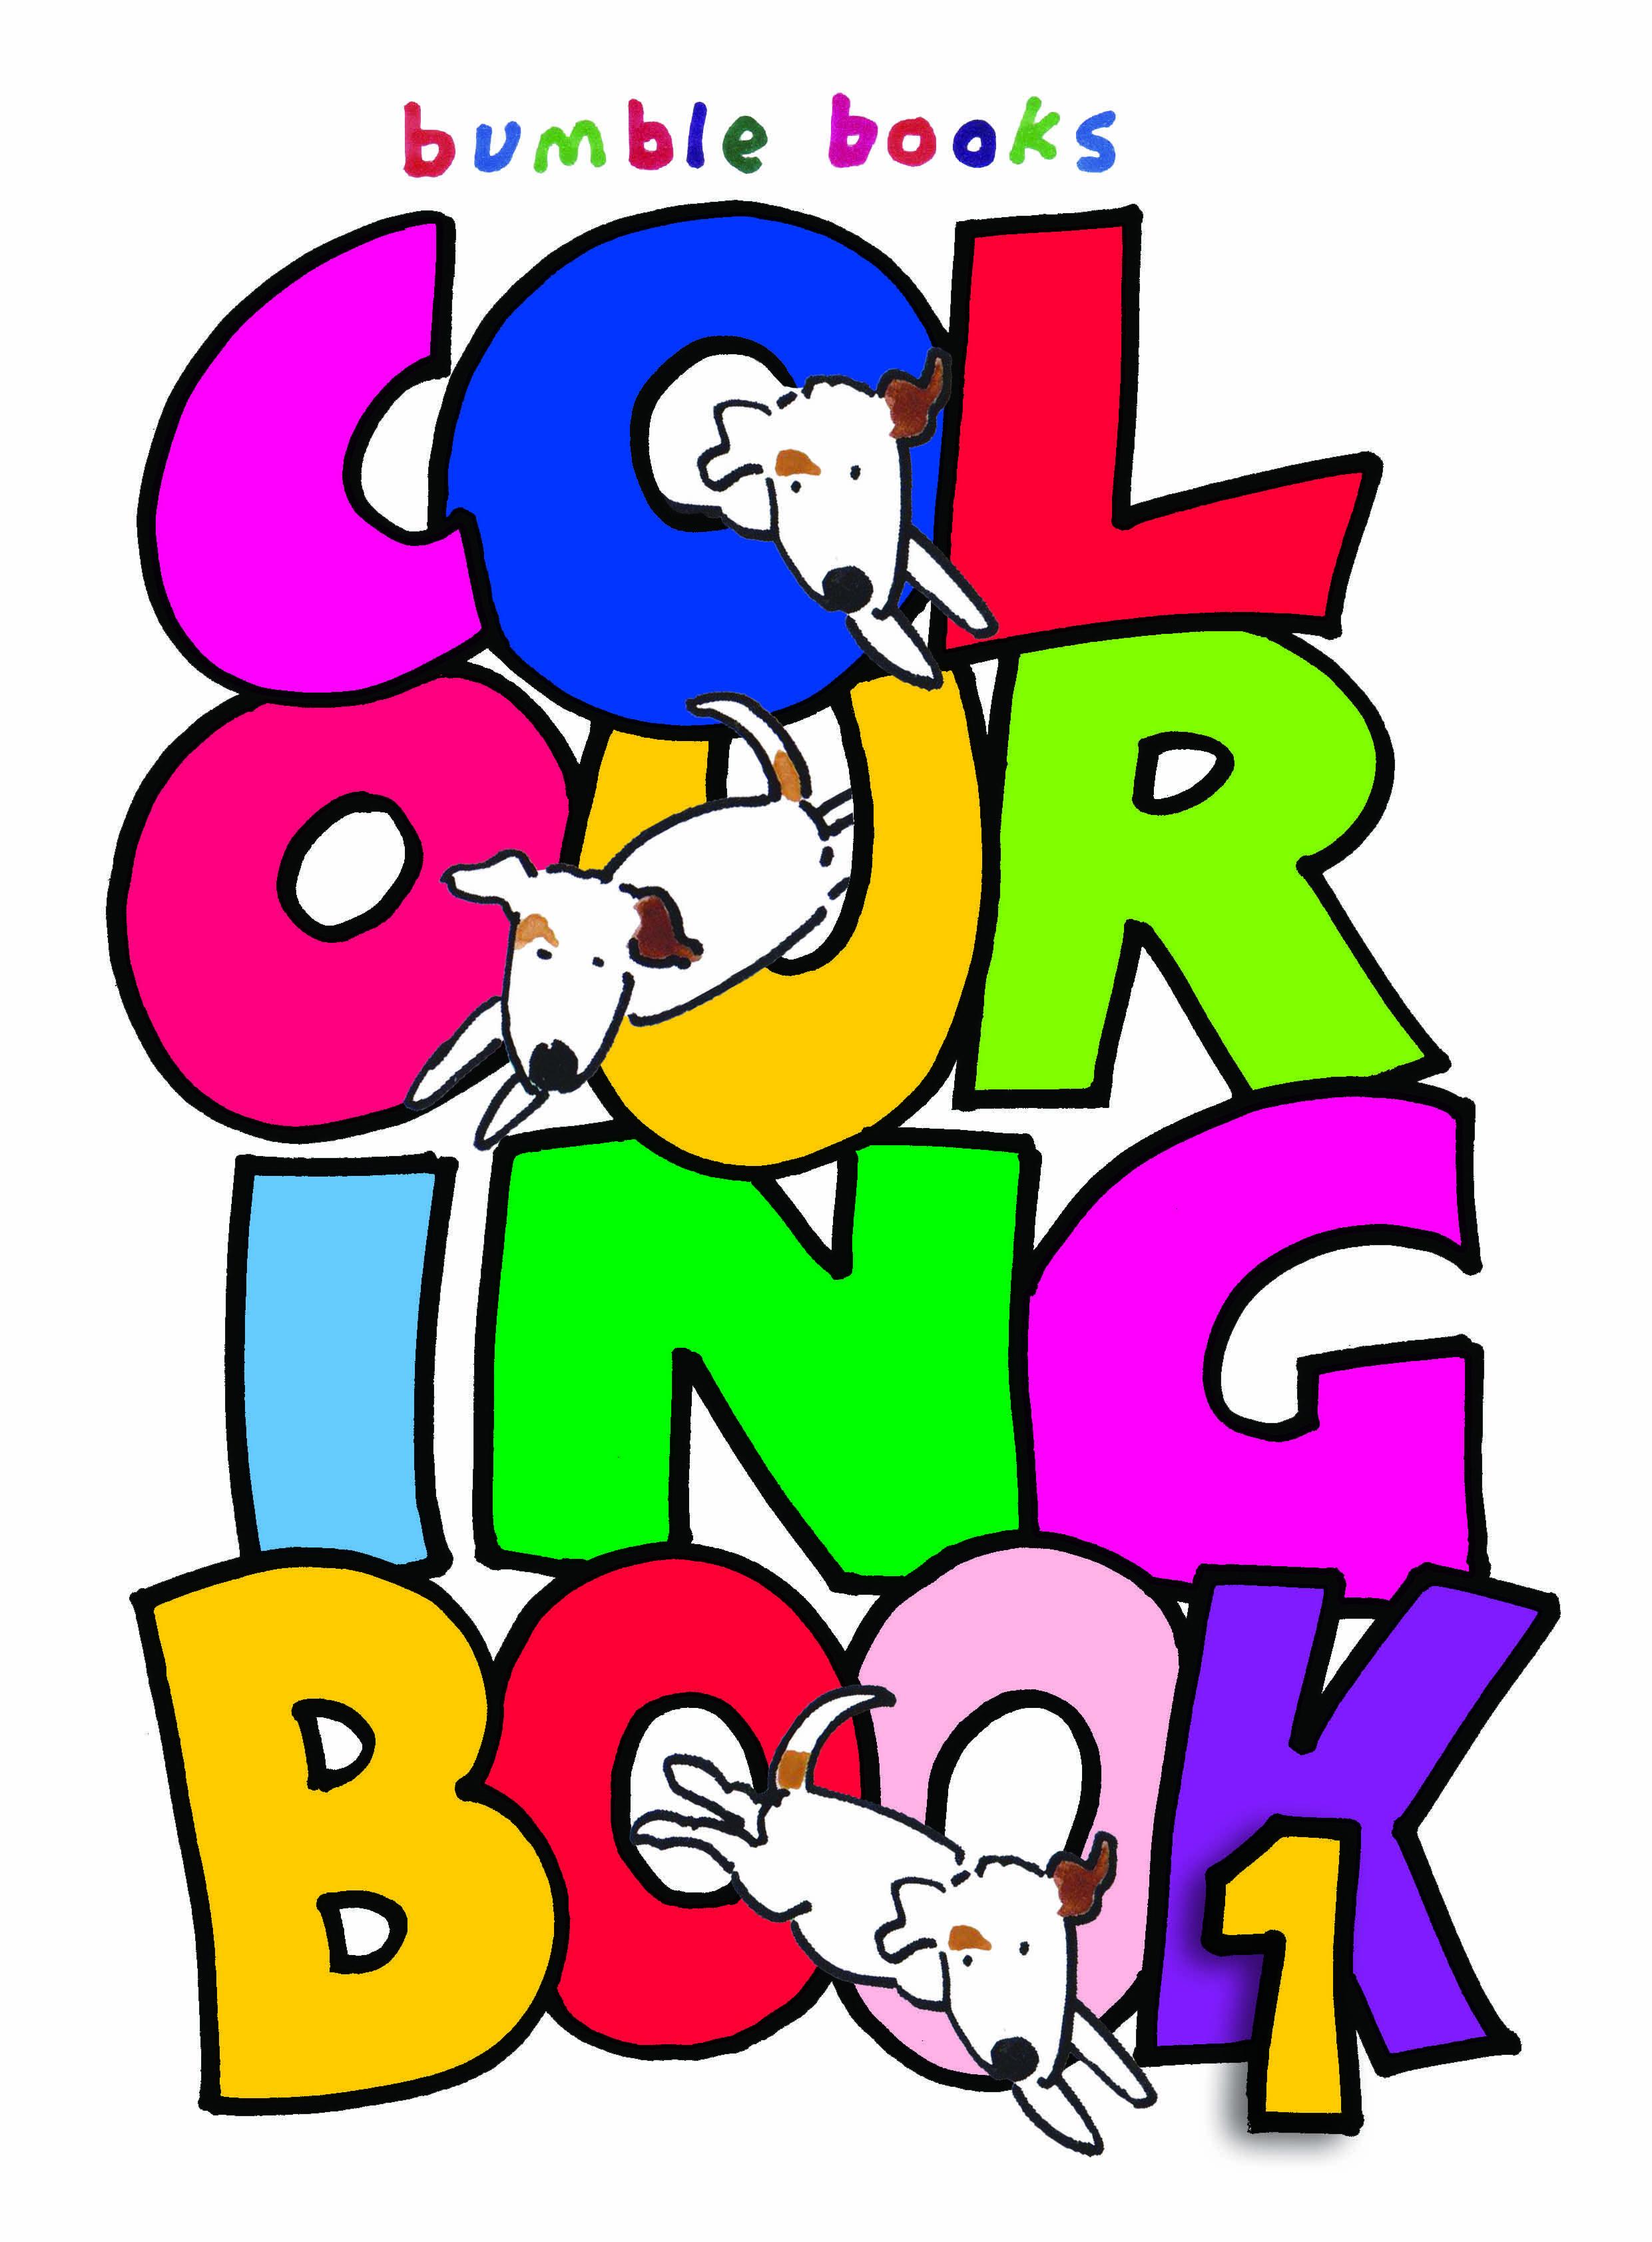 Bumble Book Club Colouring Book